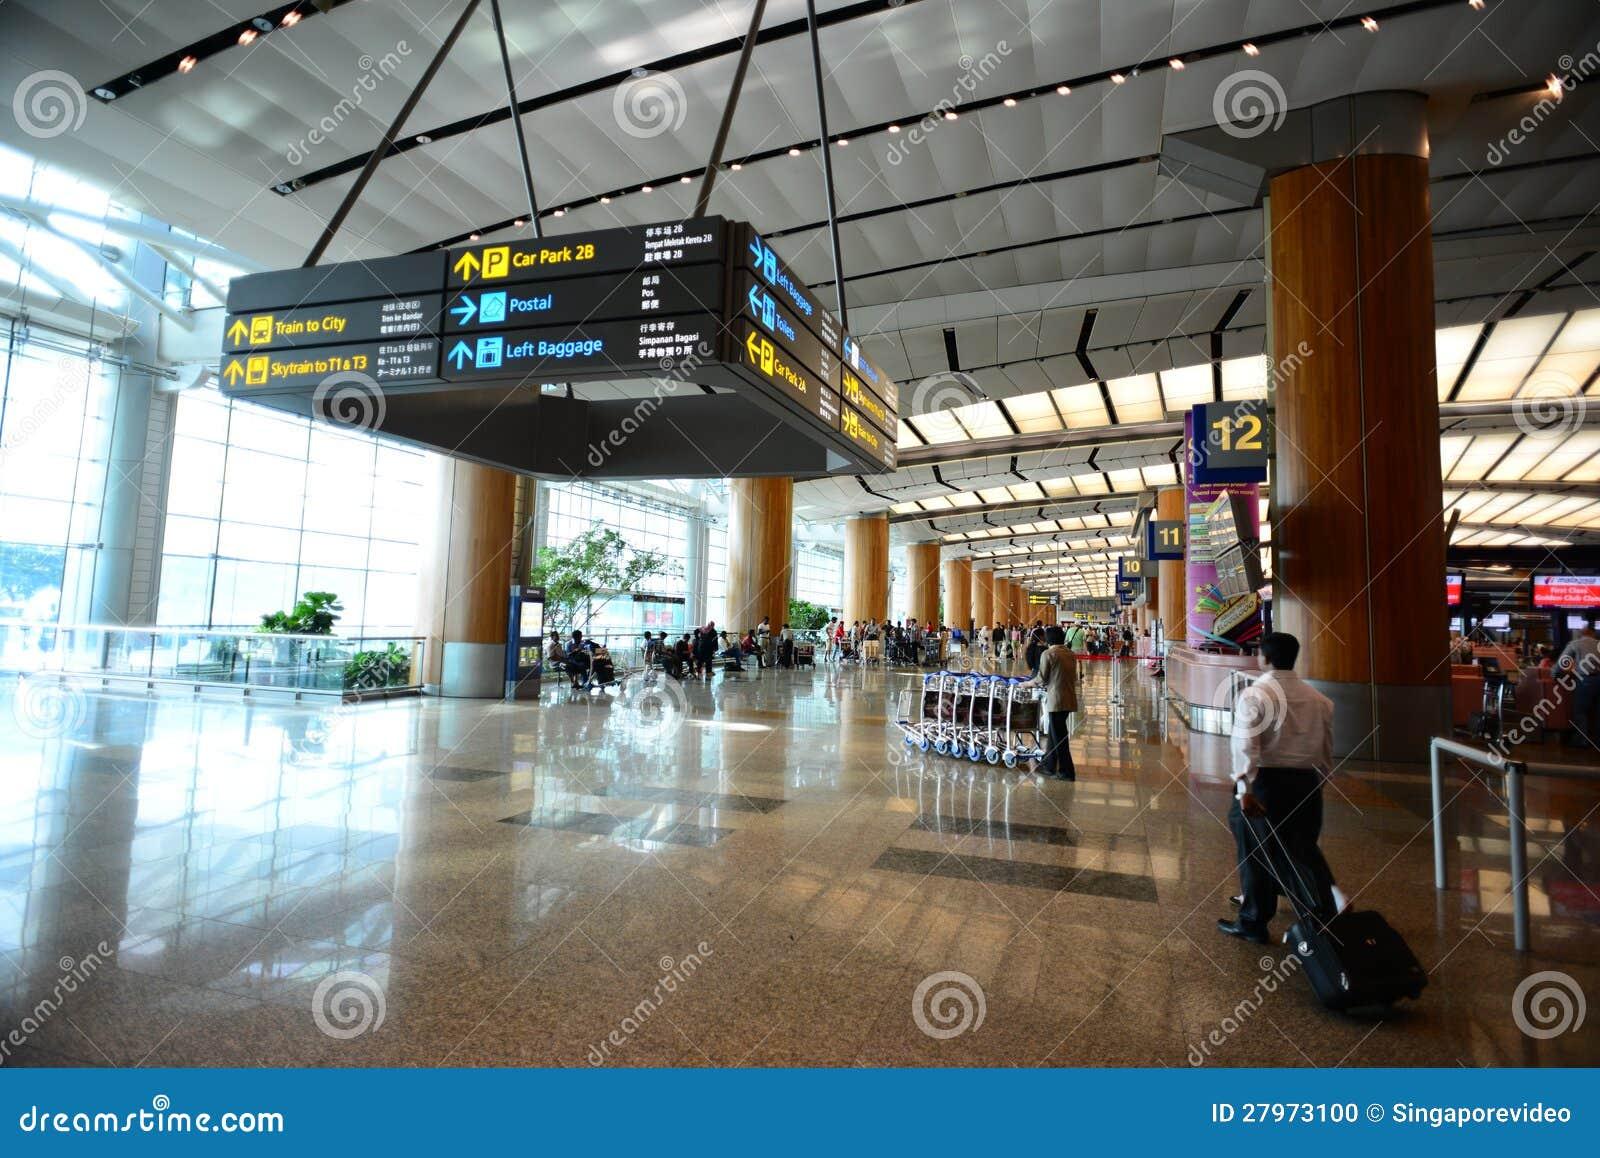 lobby of singapore changi airport editorial image image